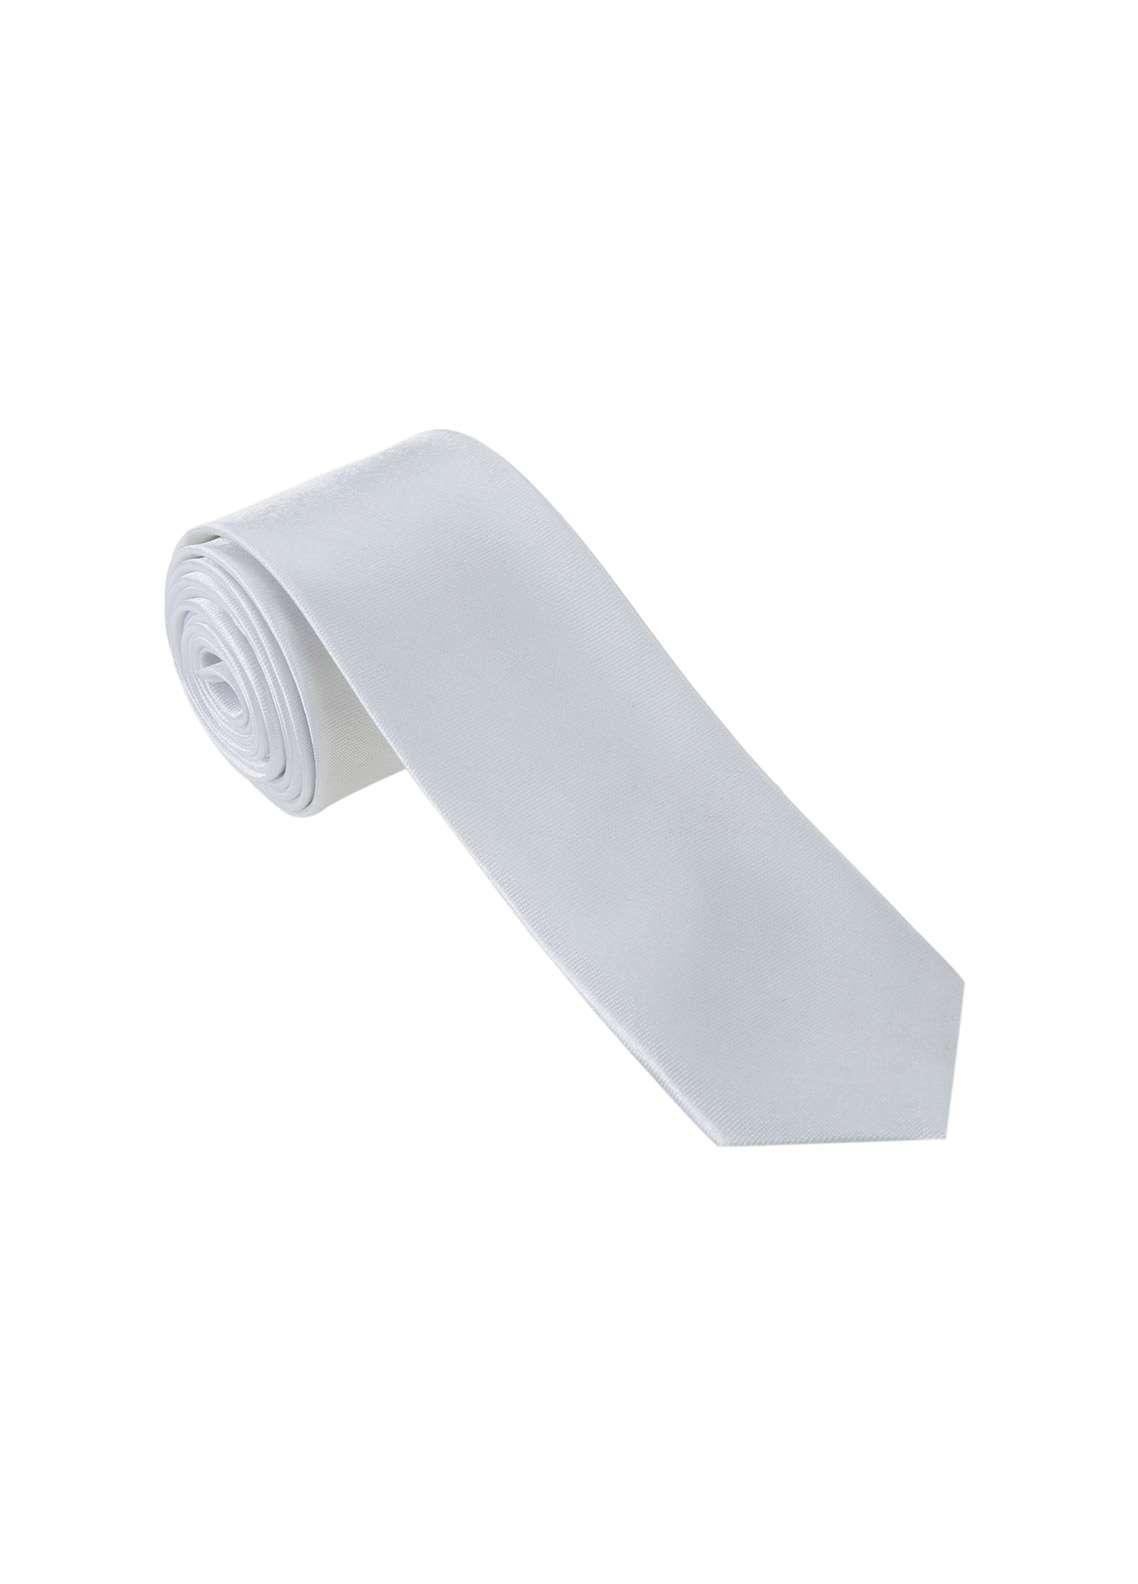 The Gentlemen's Club White Plain Silk Men's Ties